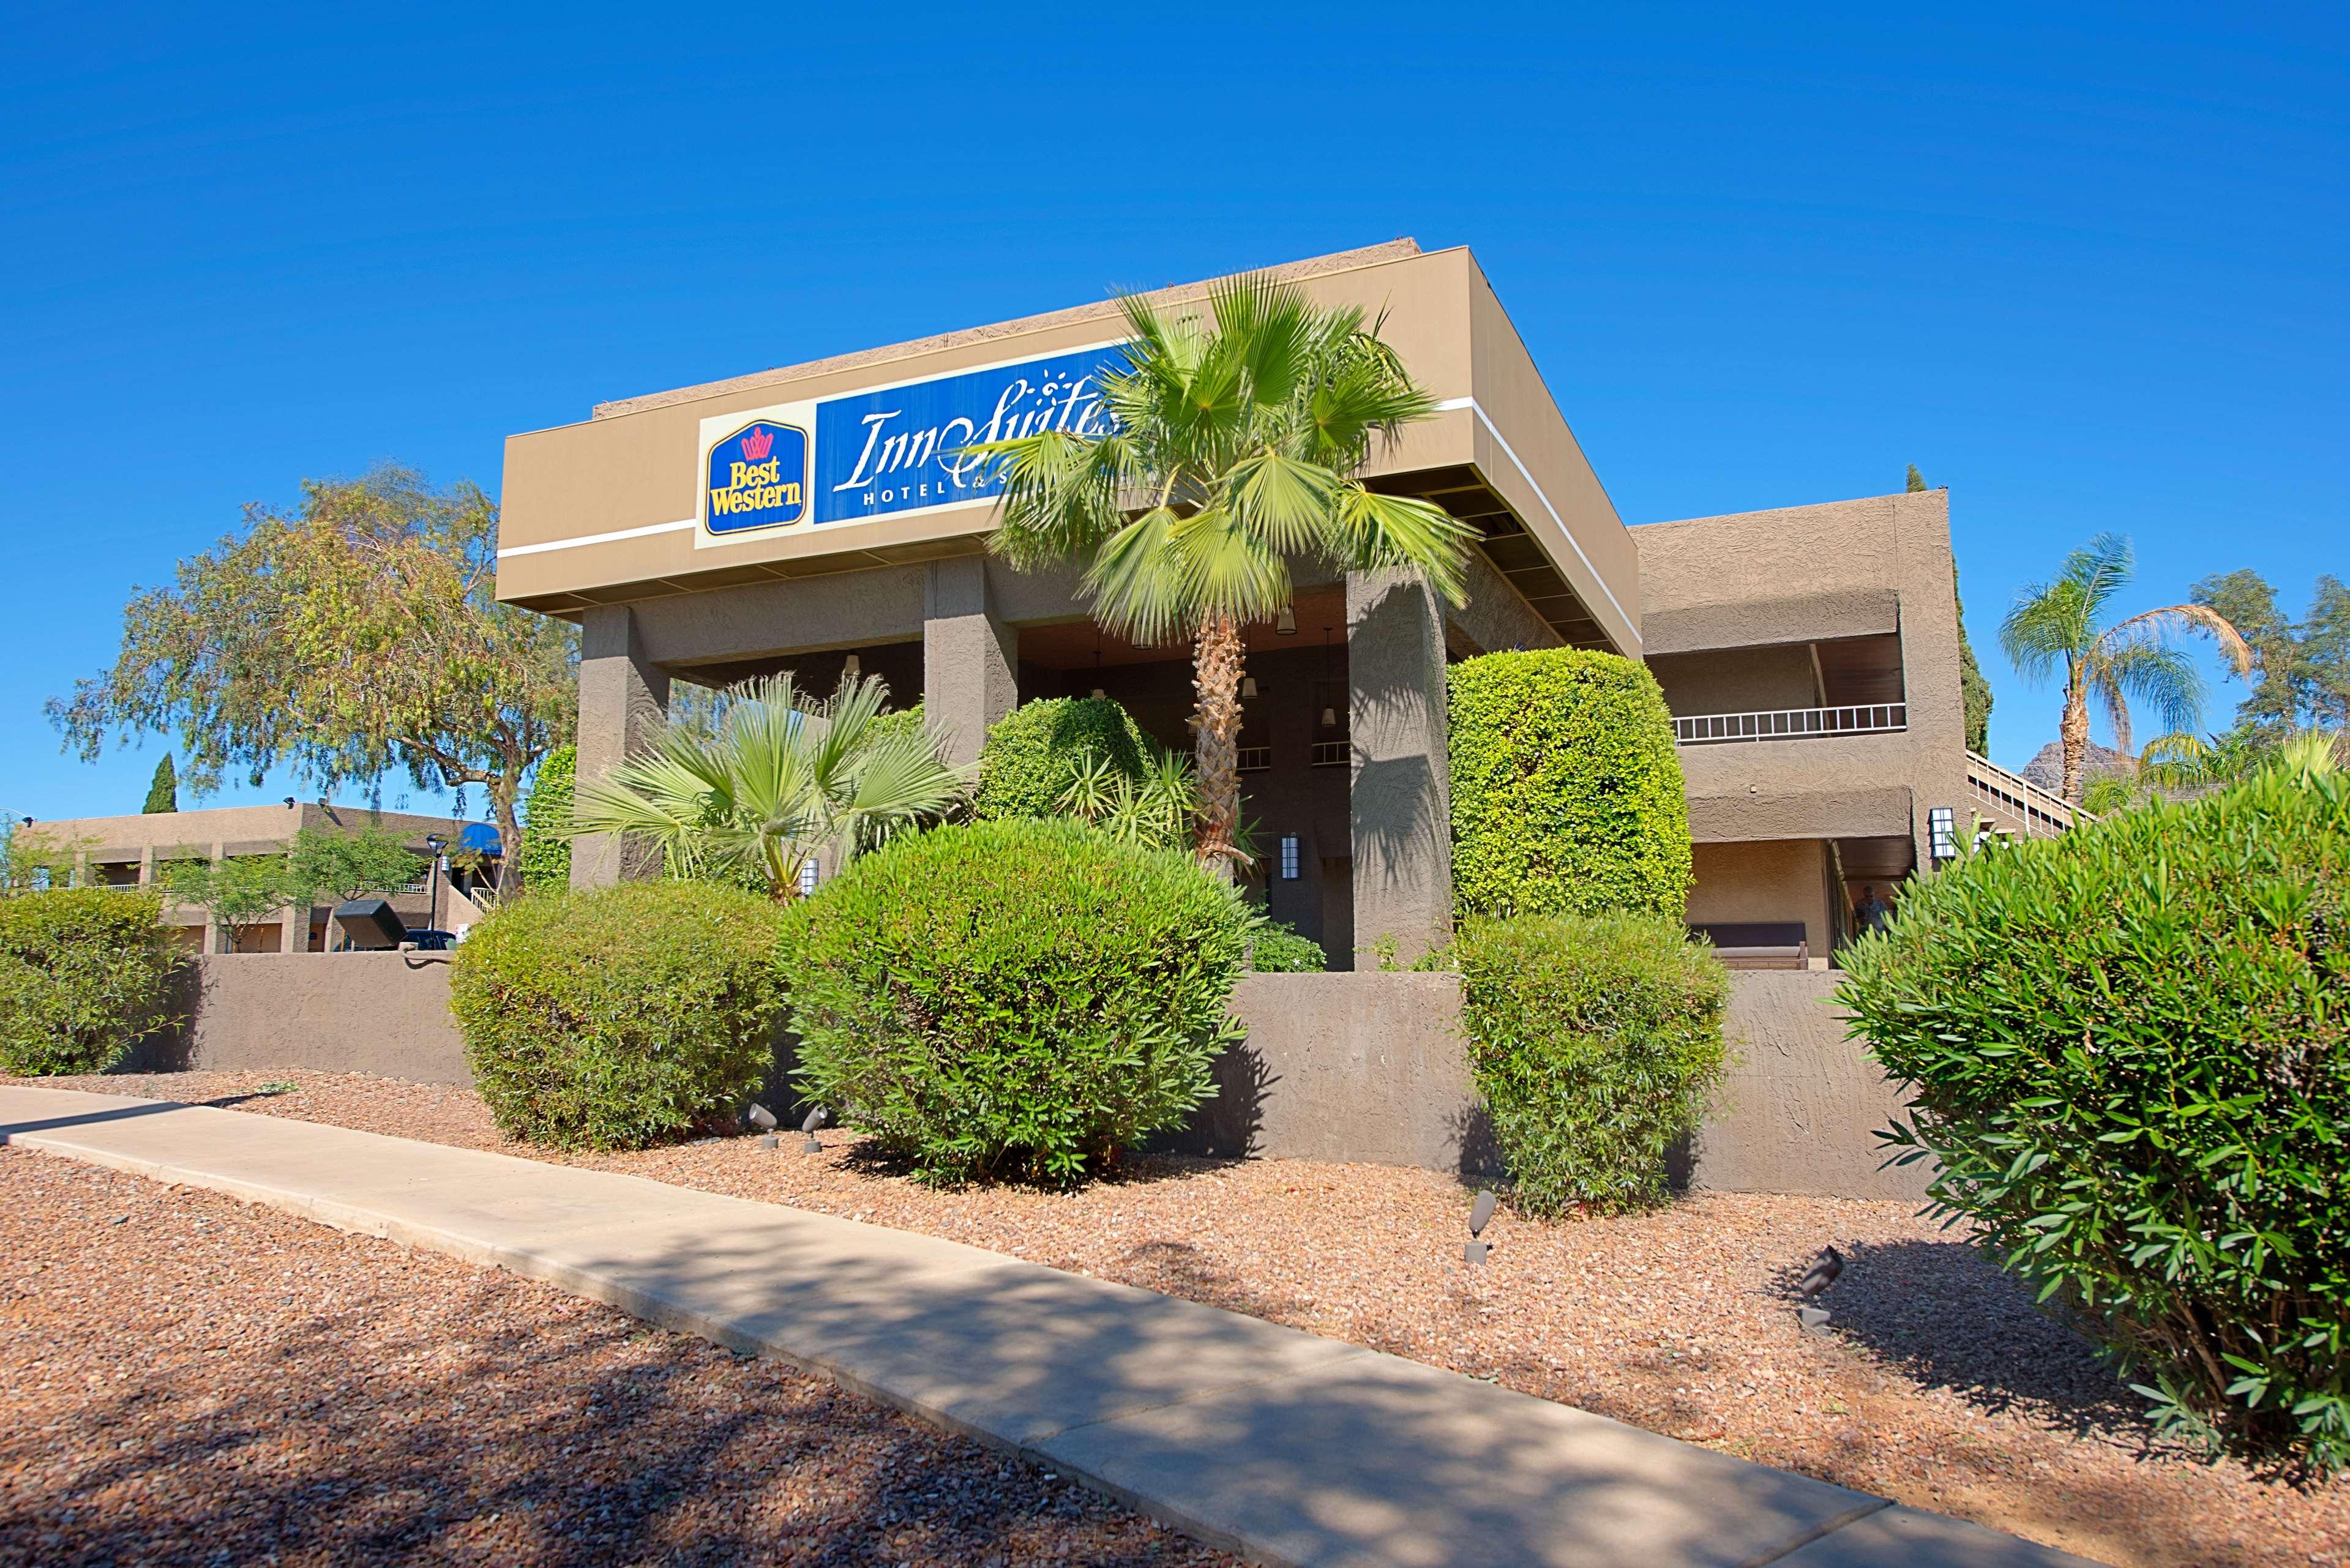 Best Western Innsuites Hotel And Suites Phoenix Az